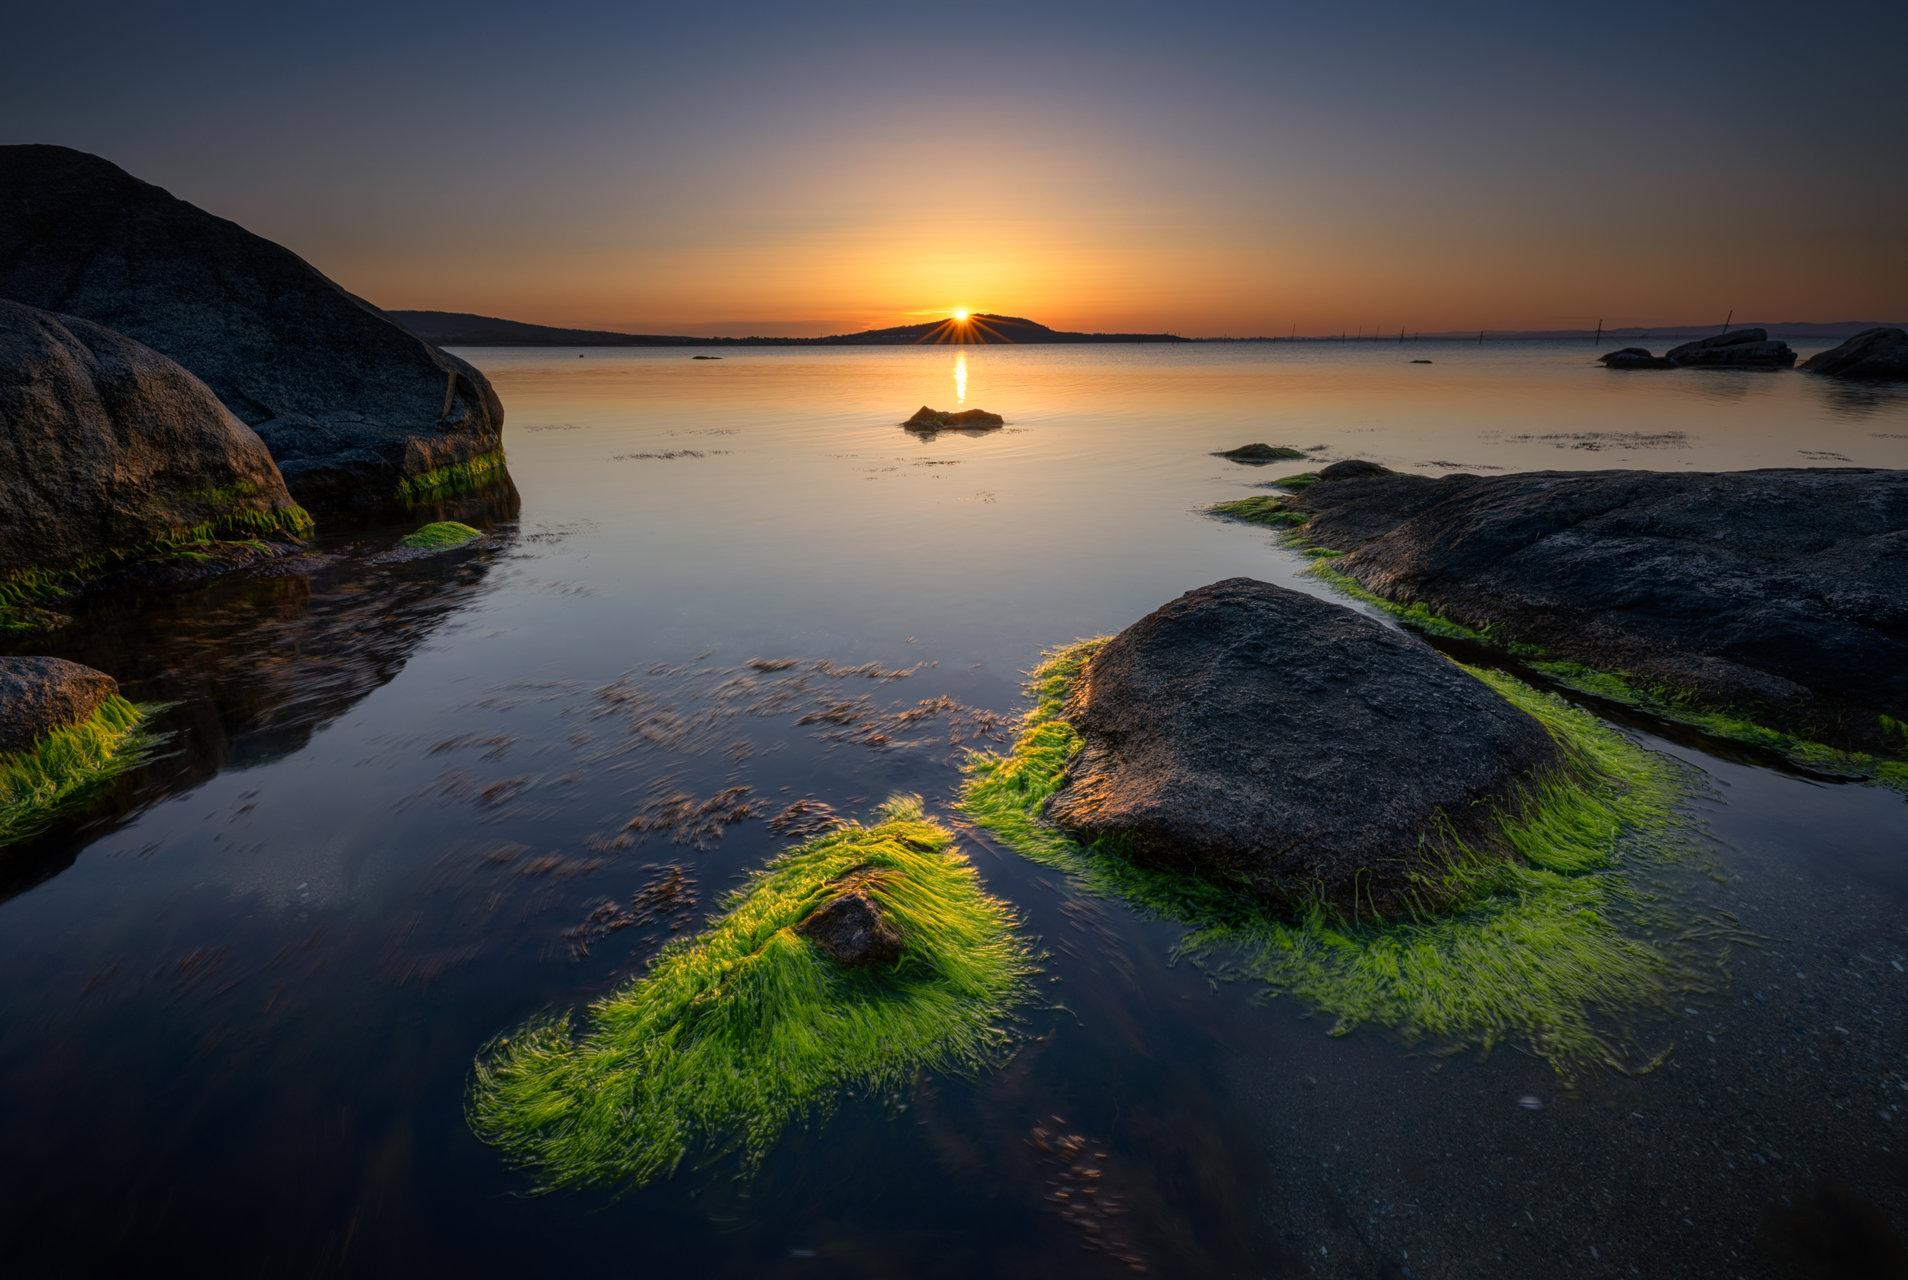 Залез край Черноморец | Author Boyko Valchev - boiko90 | PHOTO FORUM